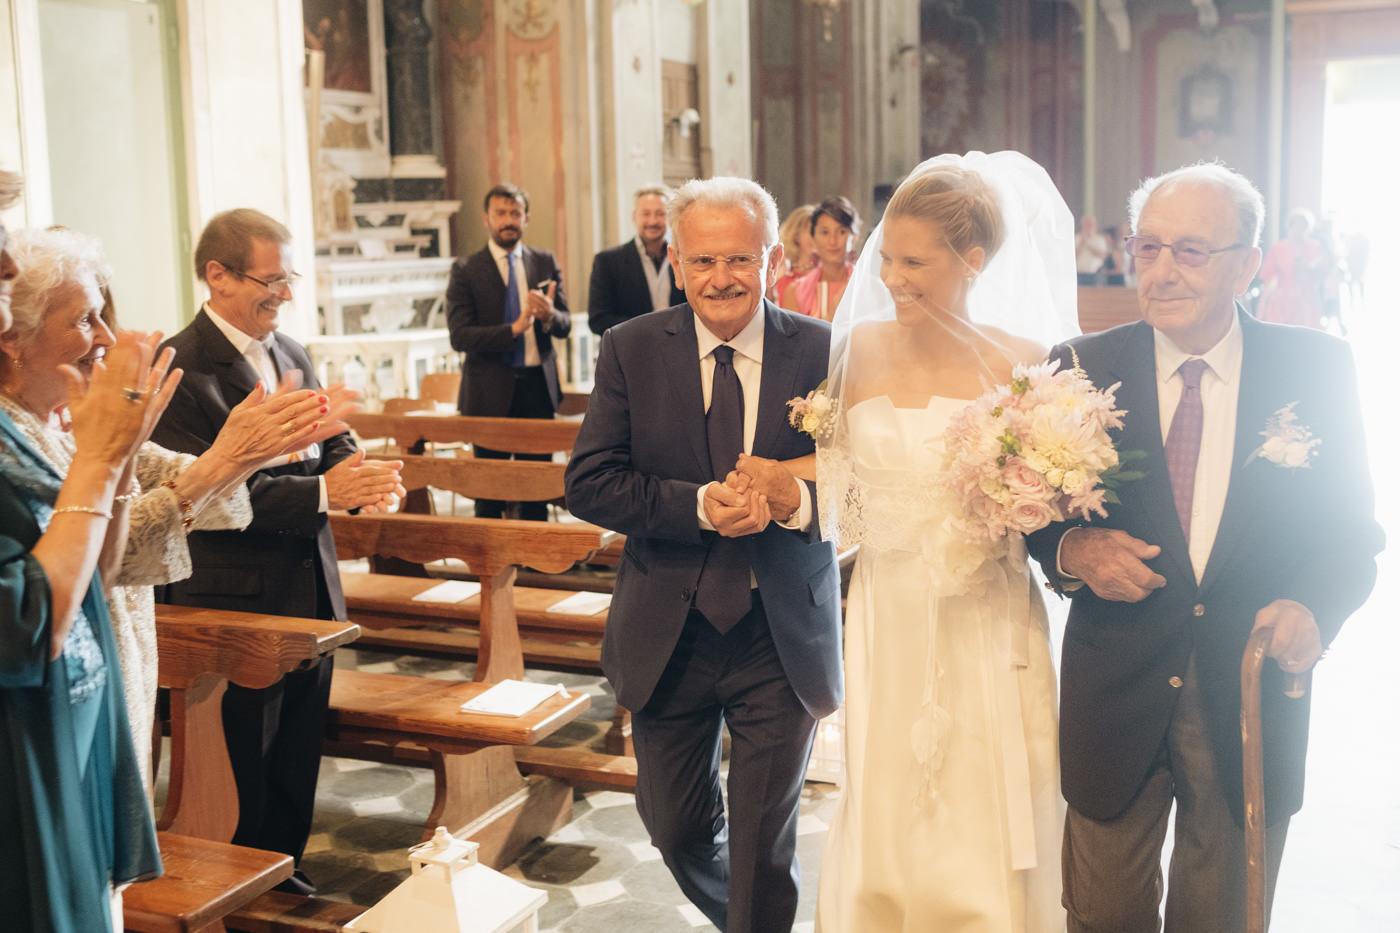 matrimoni_all_italiana_fotografo_matrimonio_cinque_terre-27.jpg